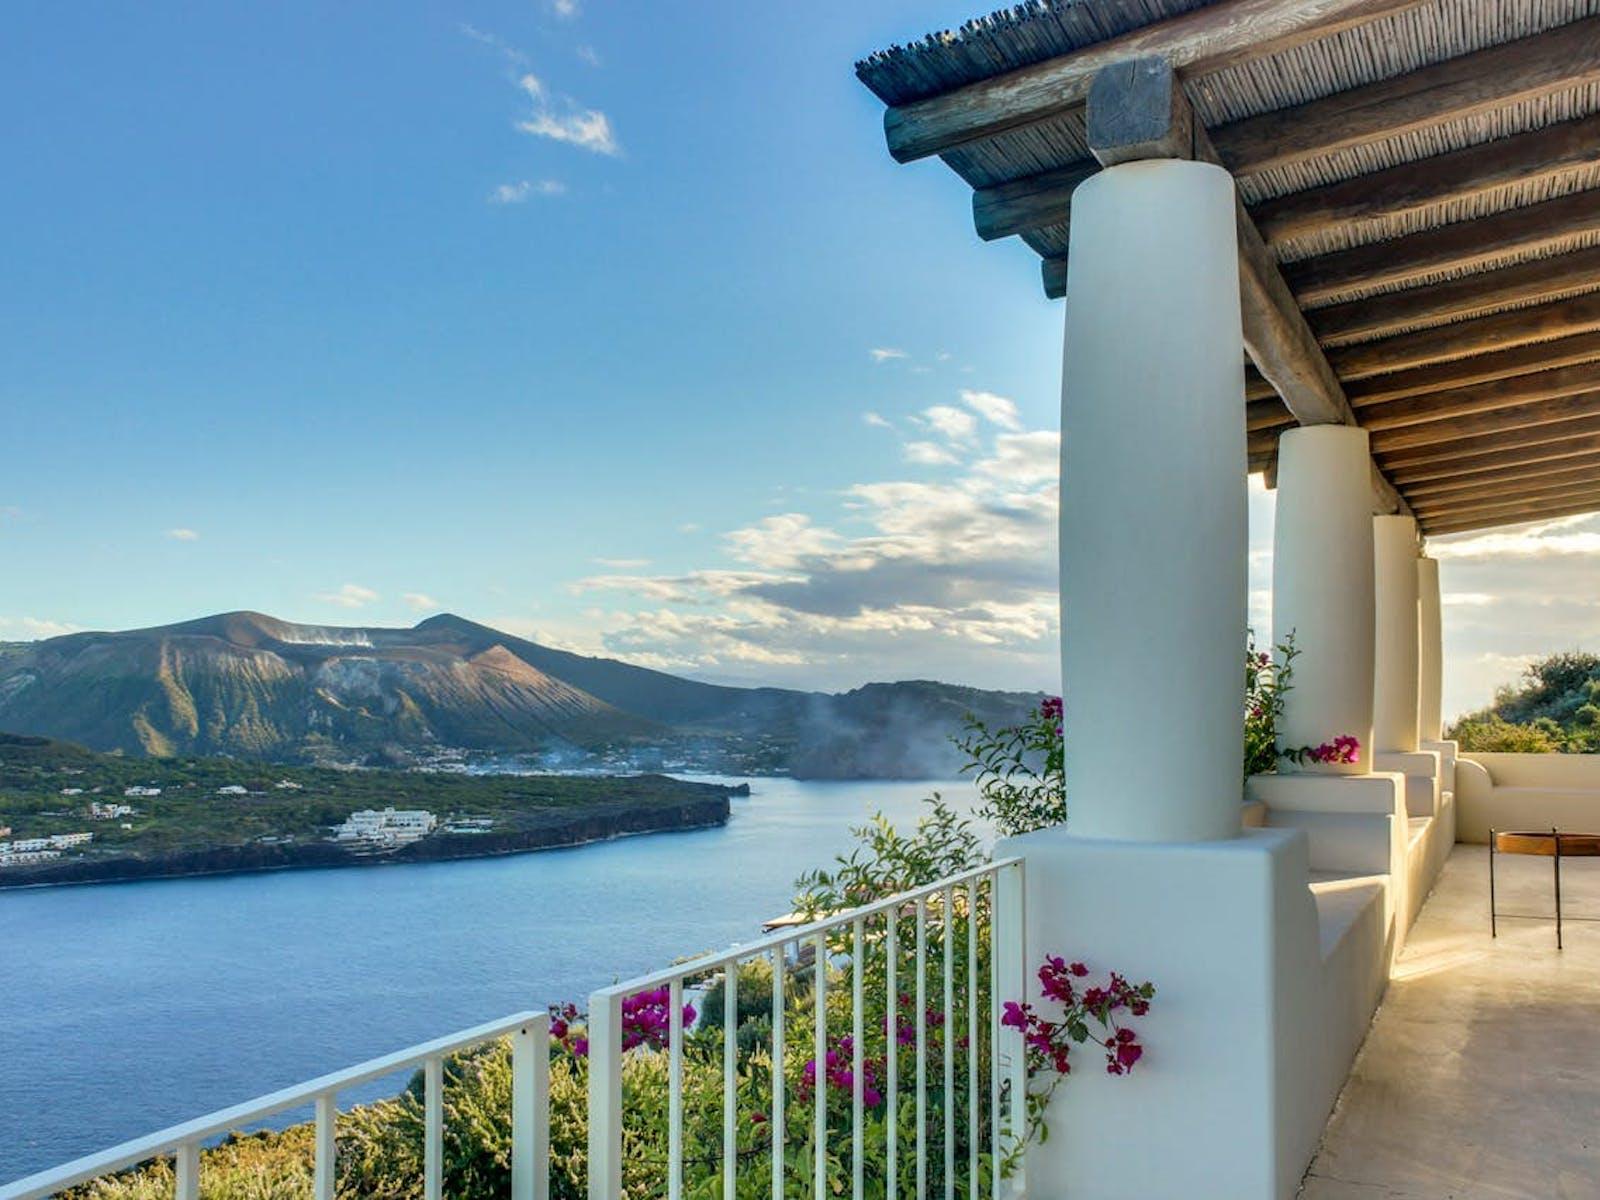 view of Tyrrhenian Sea from waterfront vacation villa on the island of Lipari